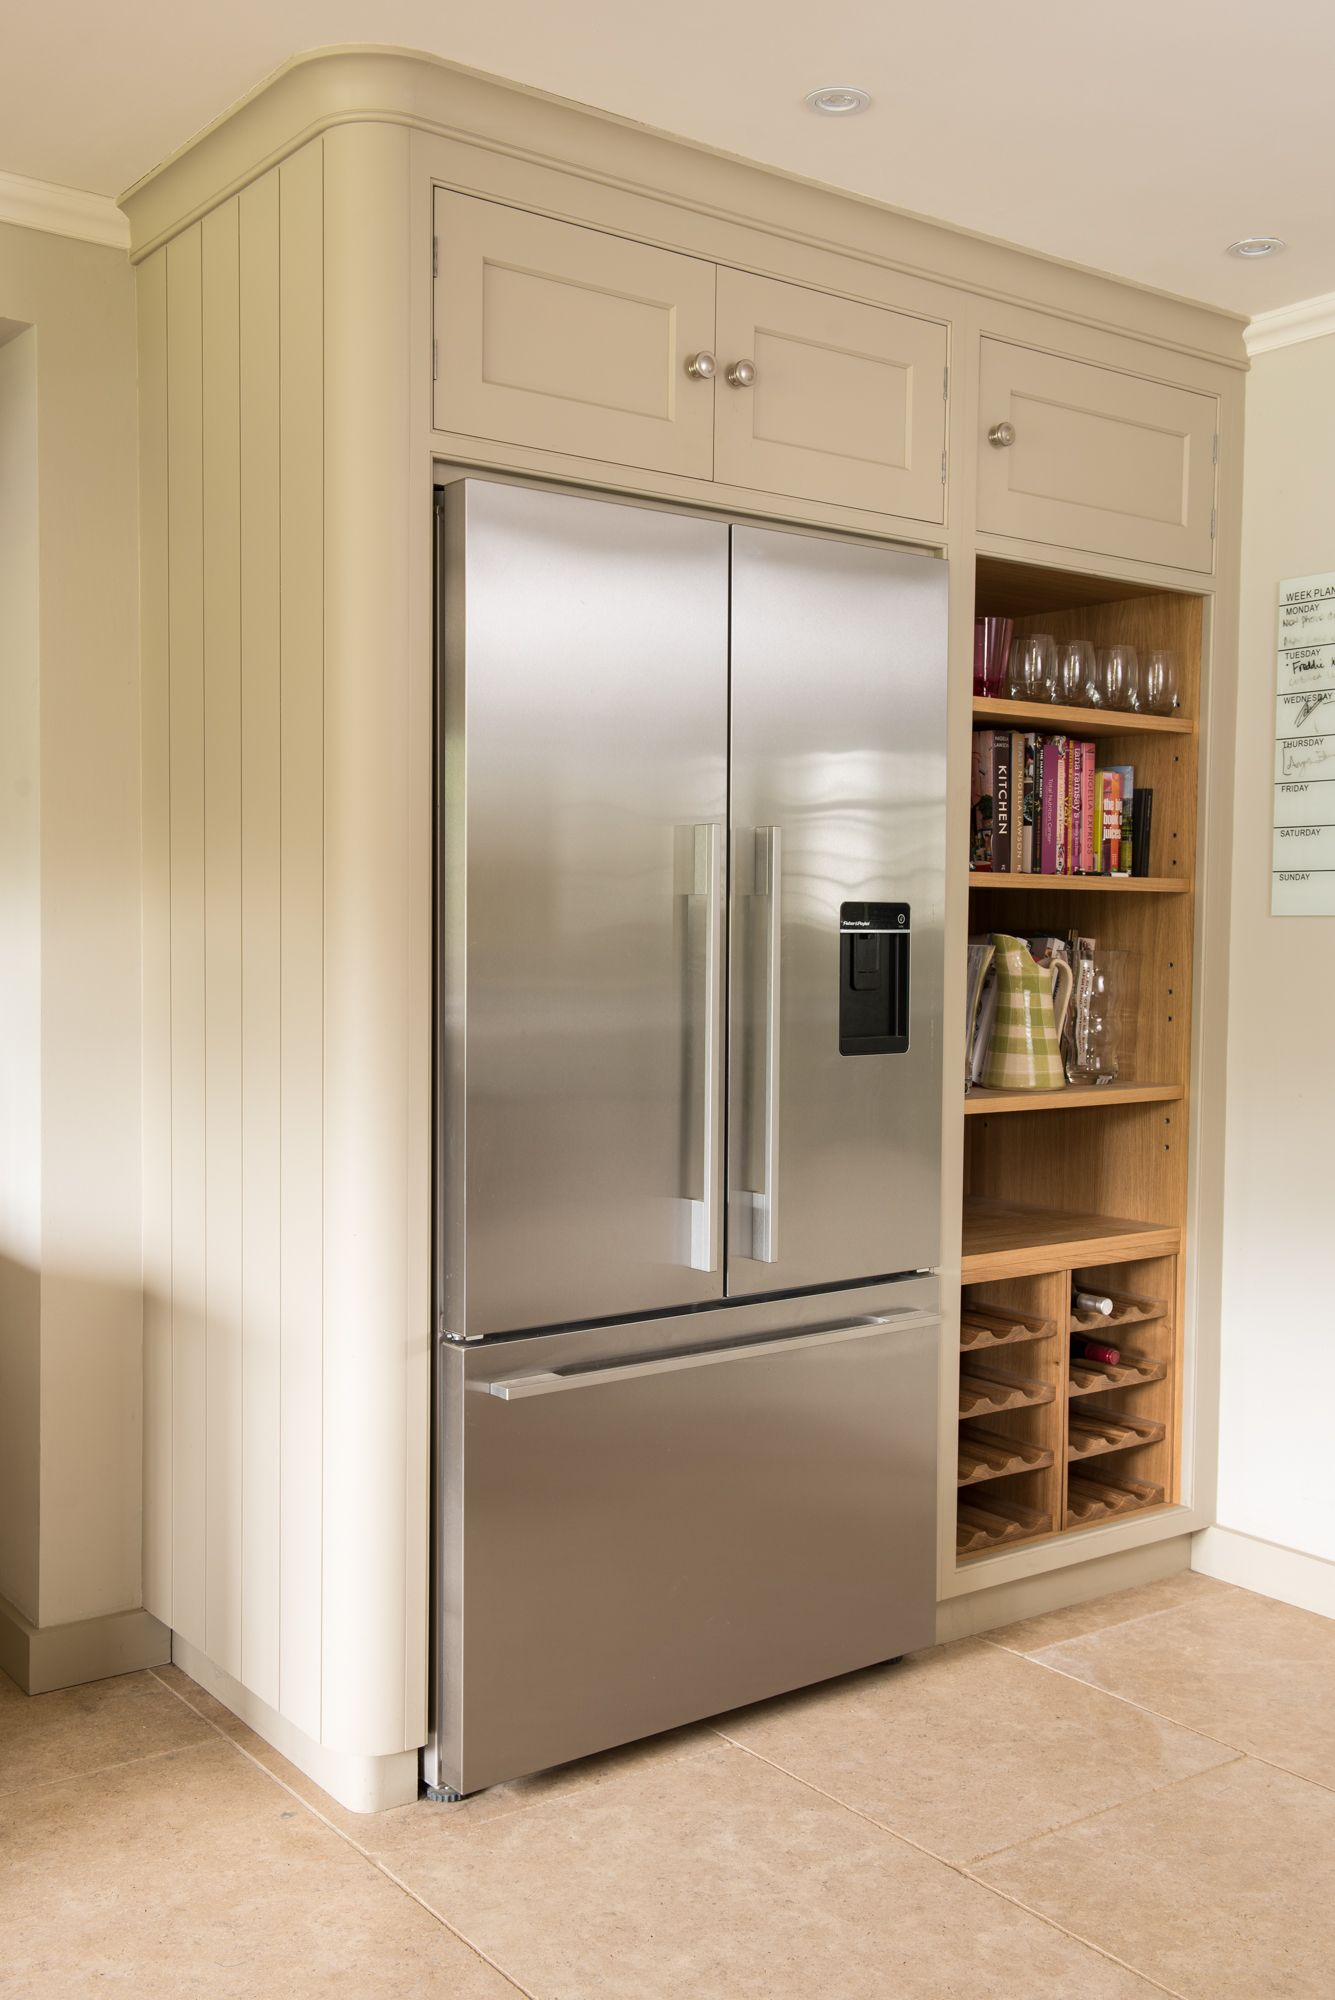 Tudor home traditional kitchens pinterest tudor craftsman and